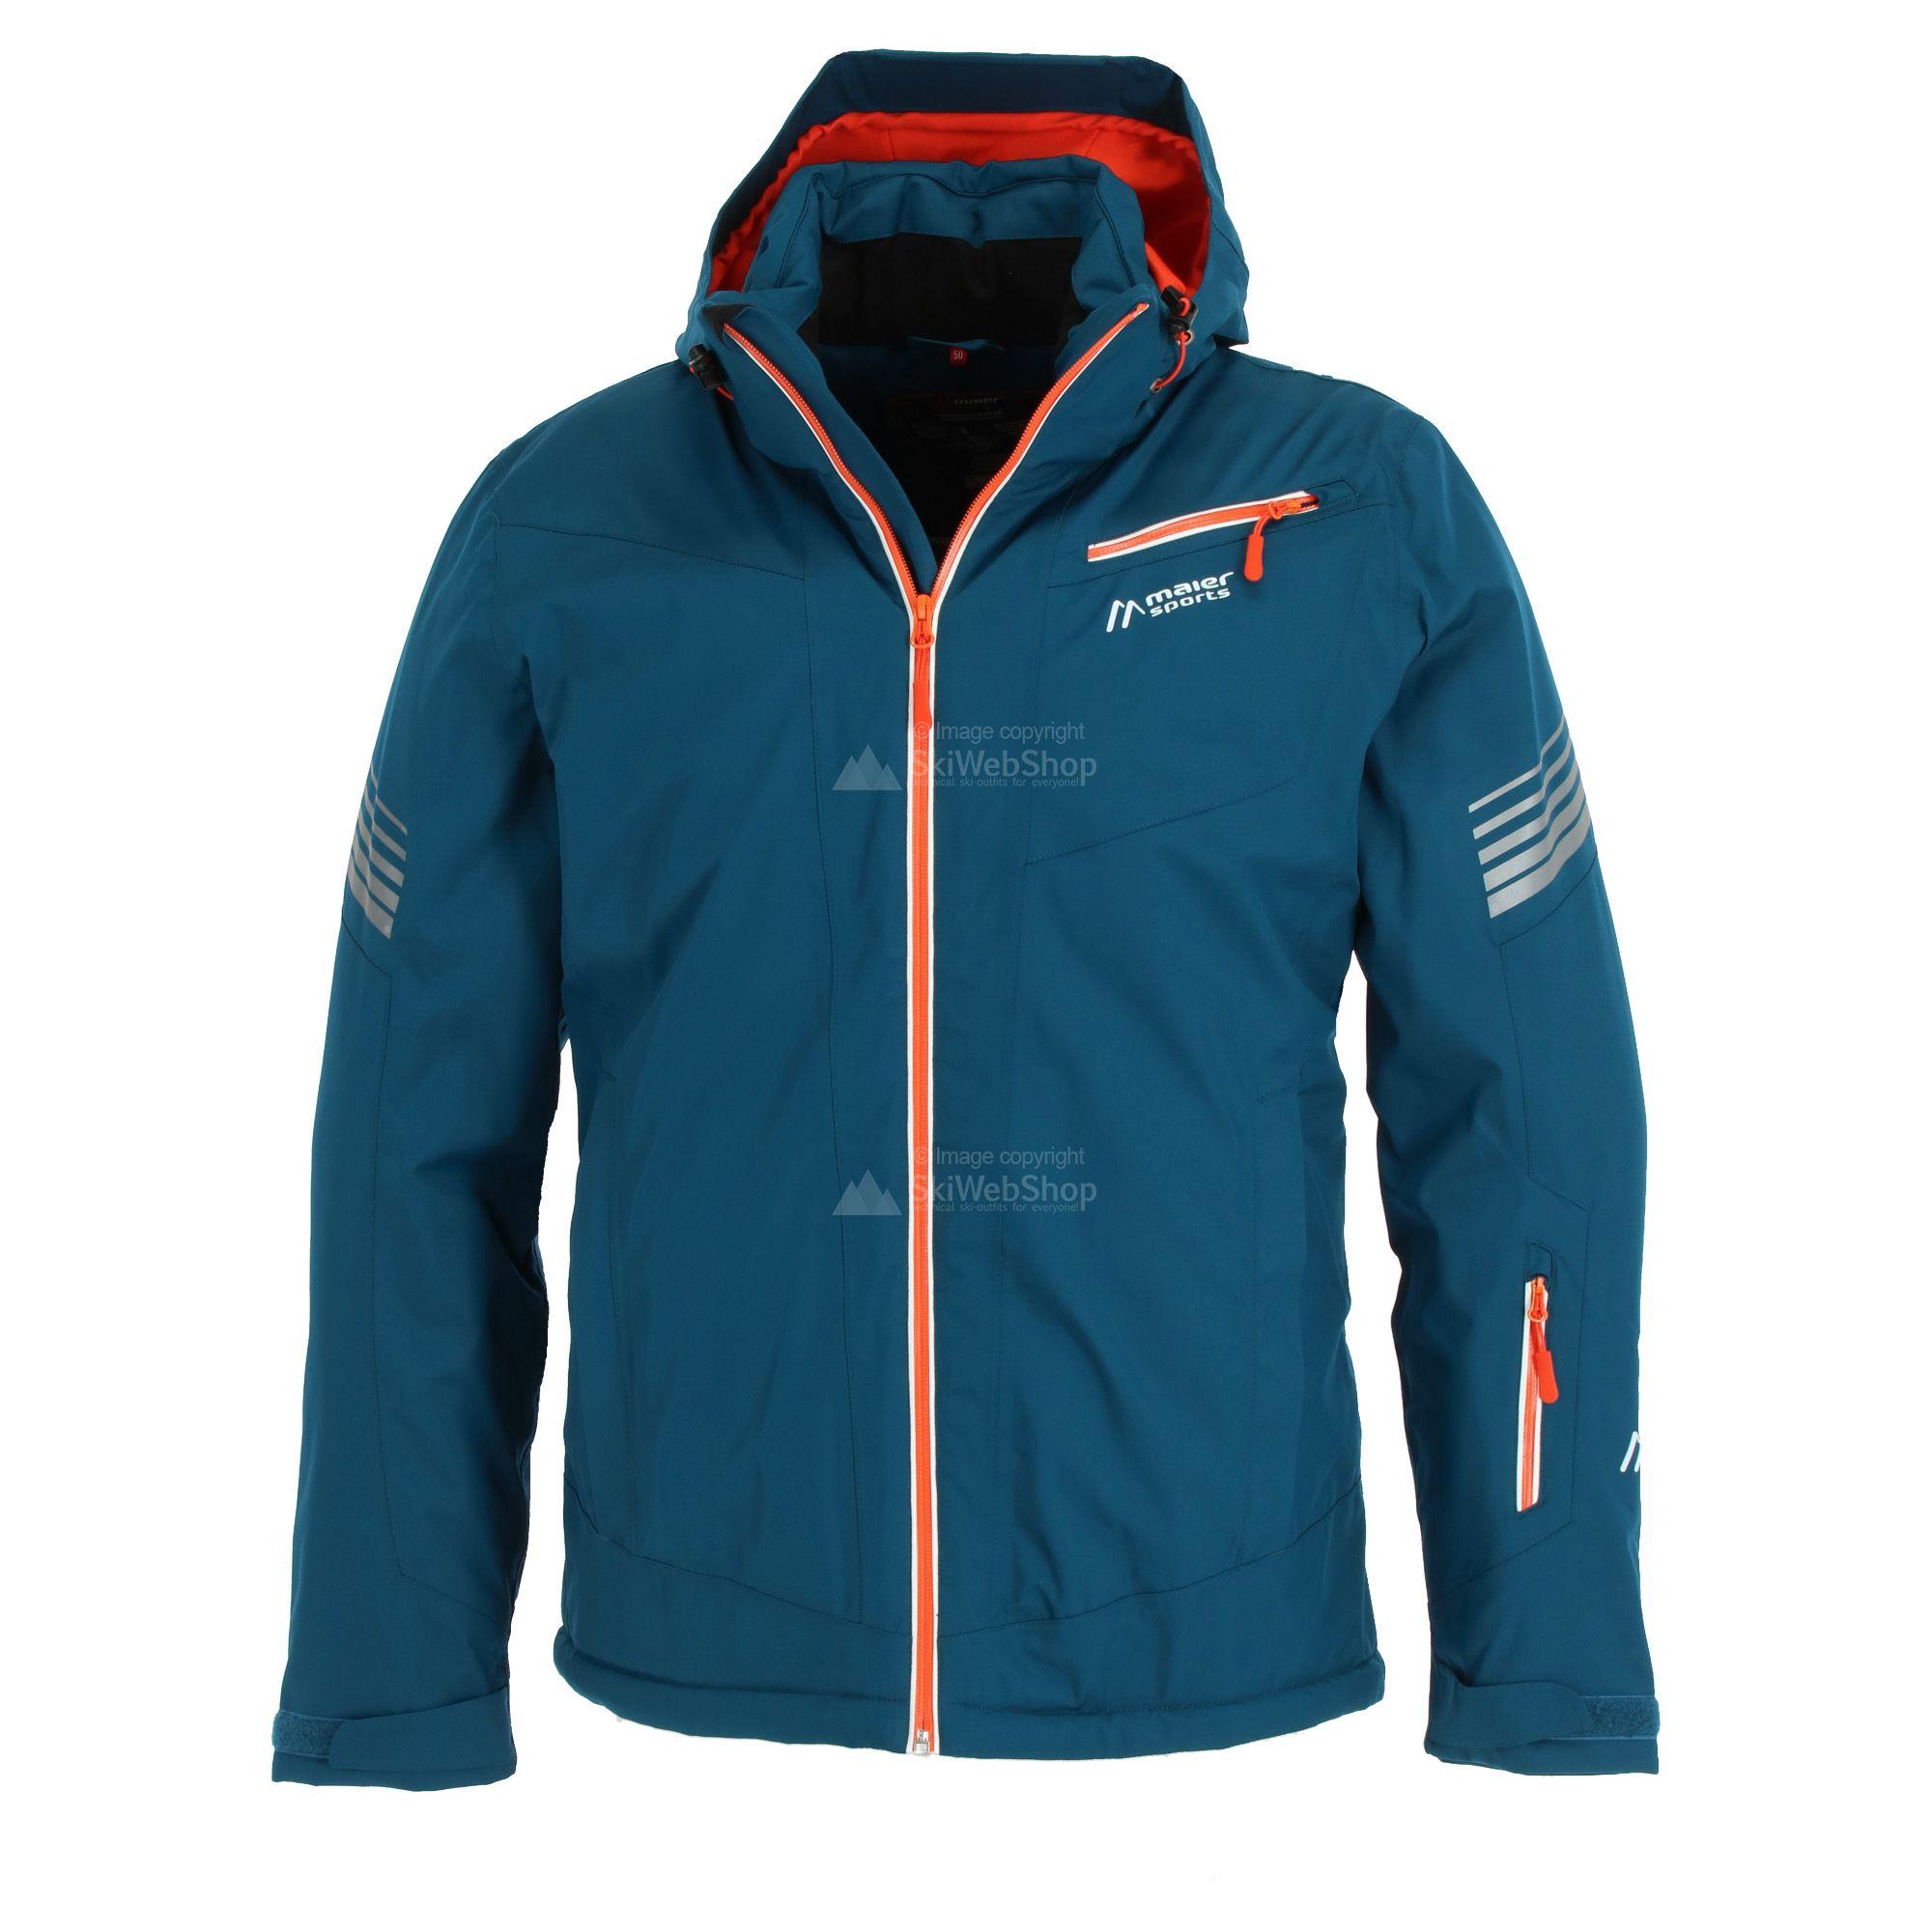 Maier Sports, Seebuck, ski jas, grote maten, heren, poseidon